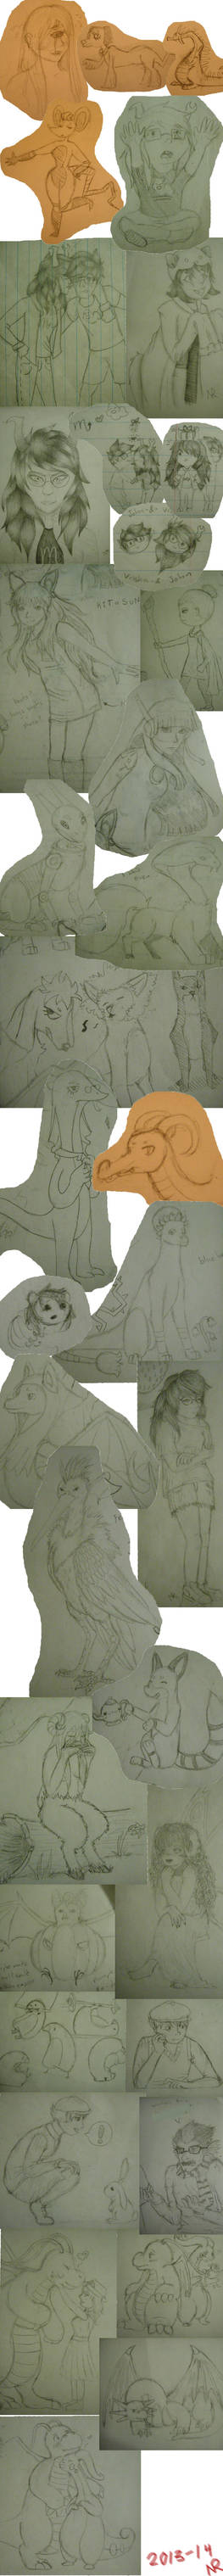 SketchDump 1 by YoshiGal4Ever